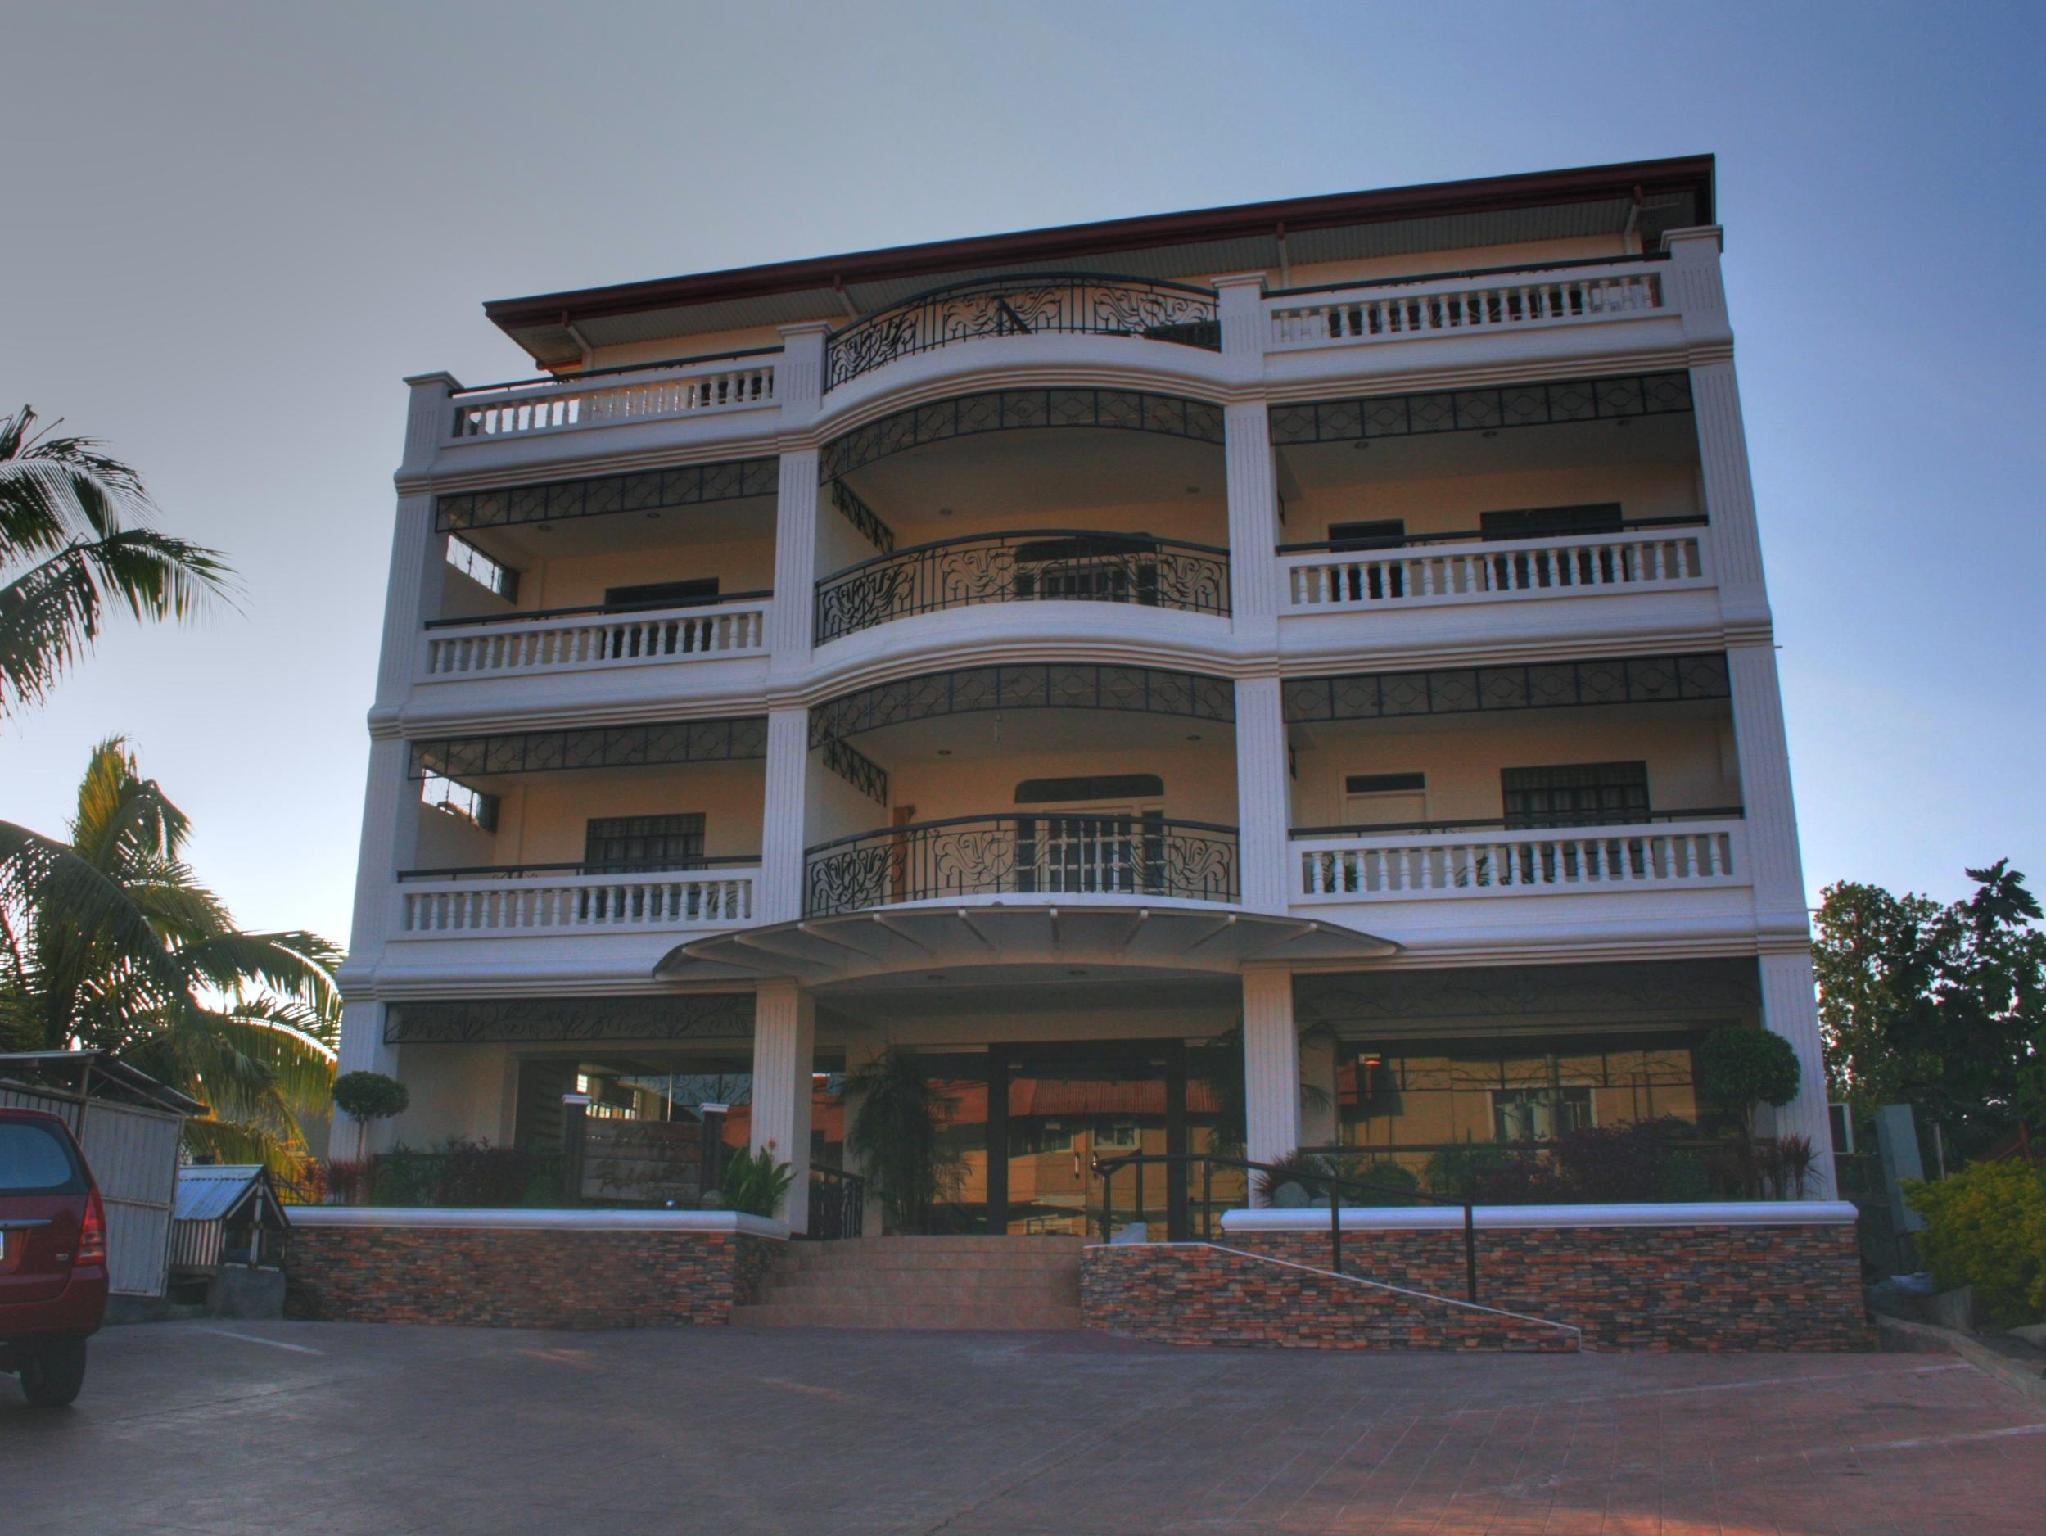 Mira de Polaris Hotel Laoag